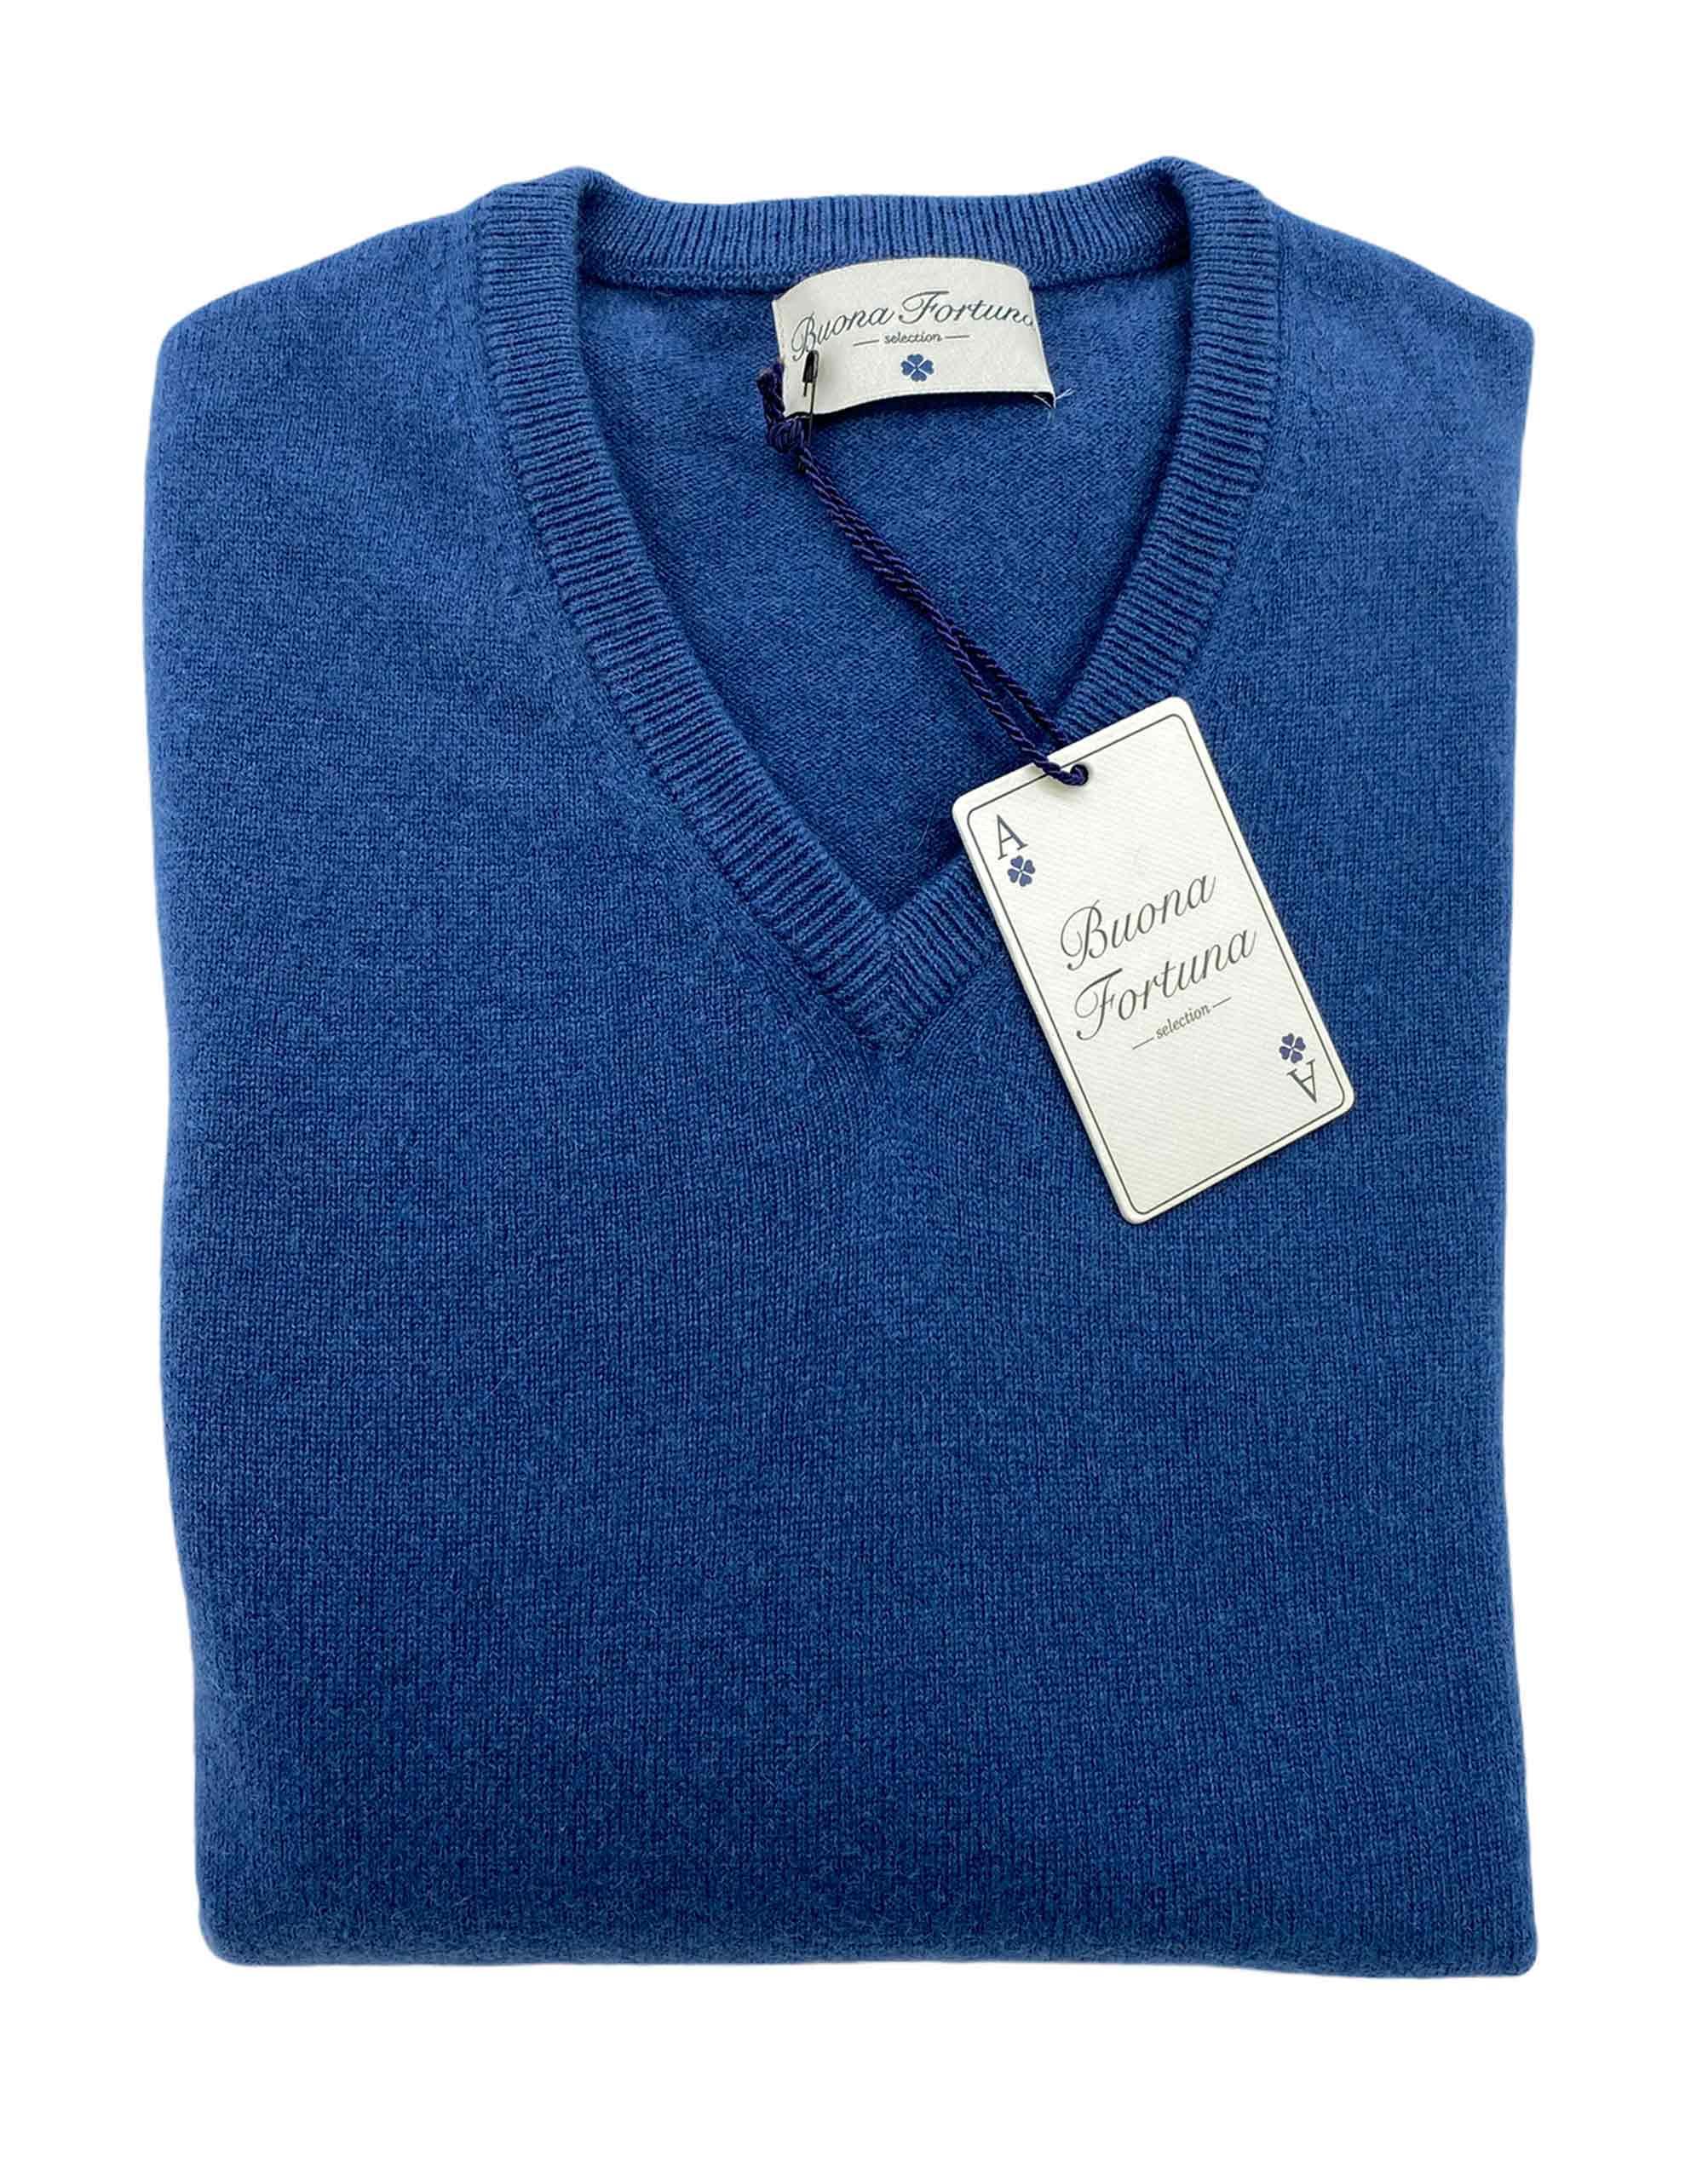 jersey buona fortuna comprar online jerseis italianos exlusivos twill azul jeans shop